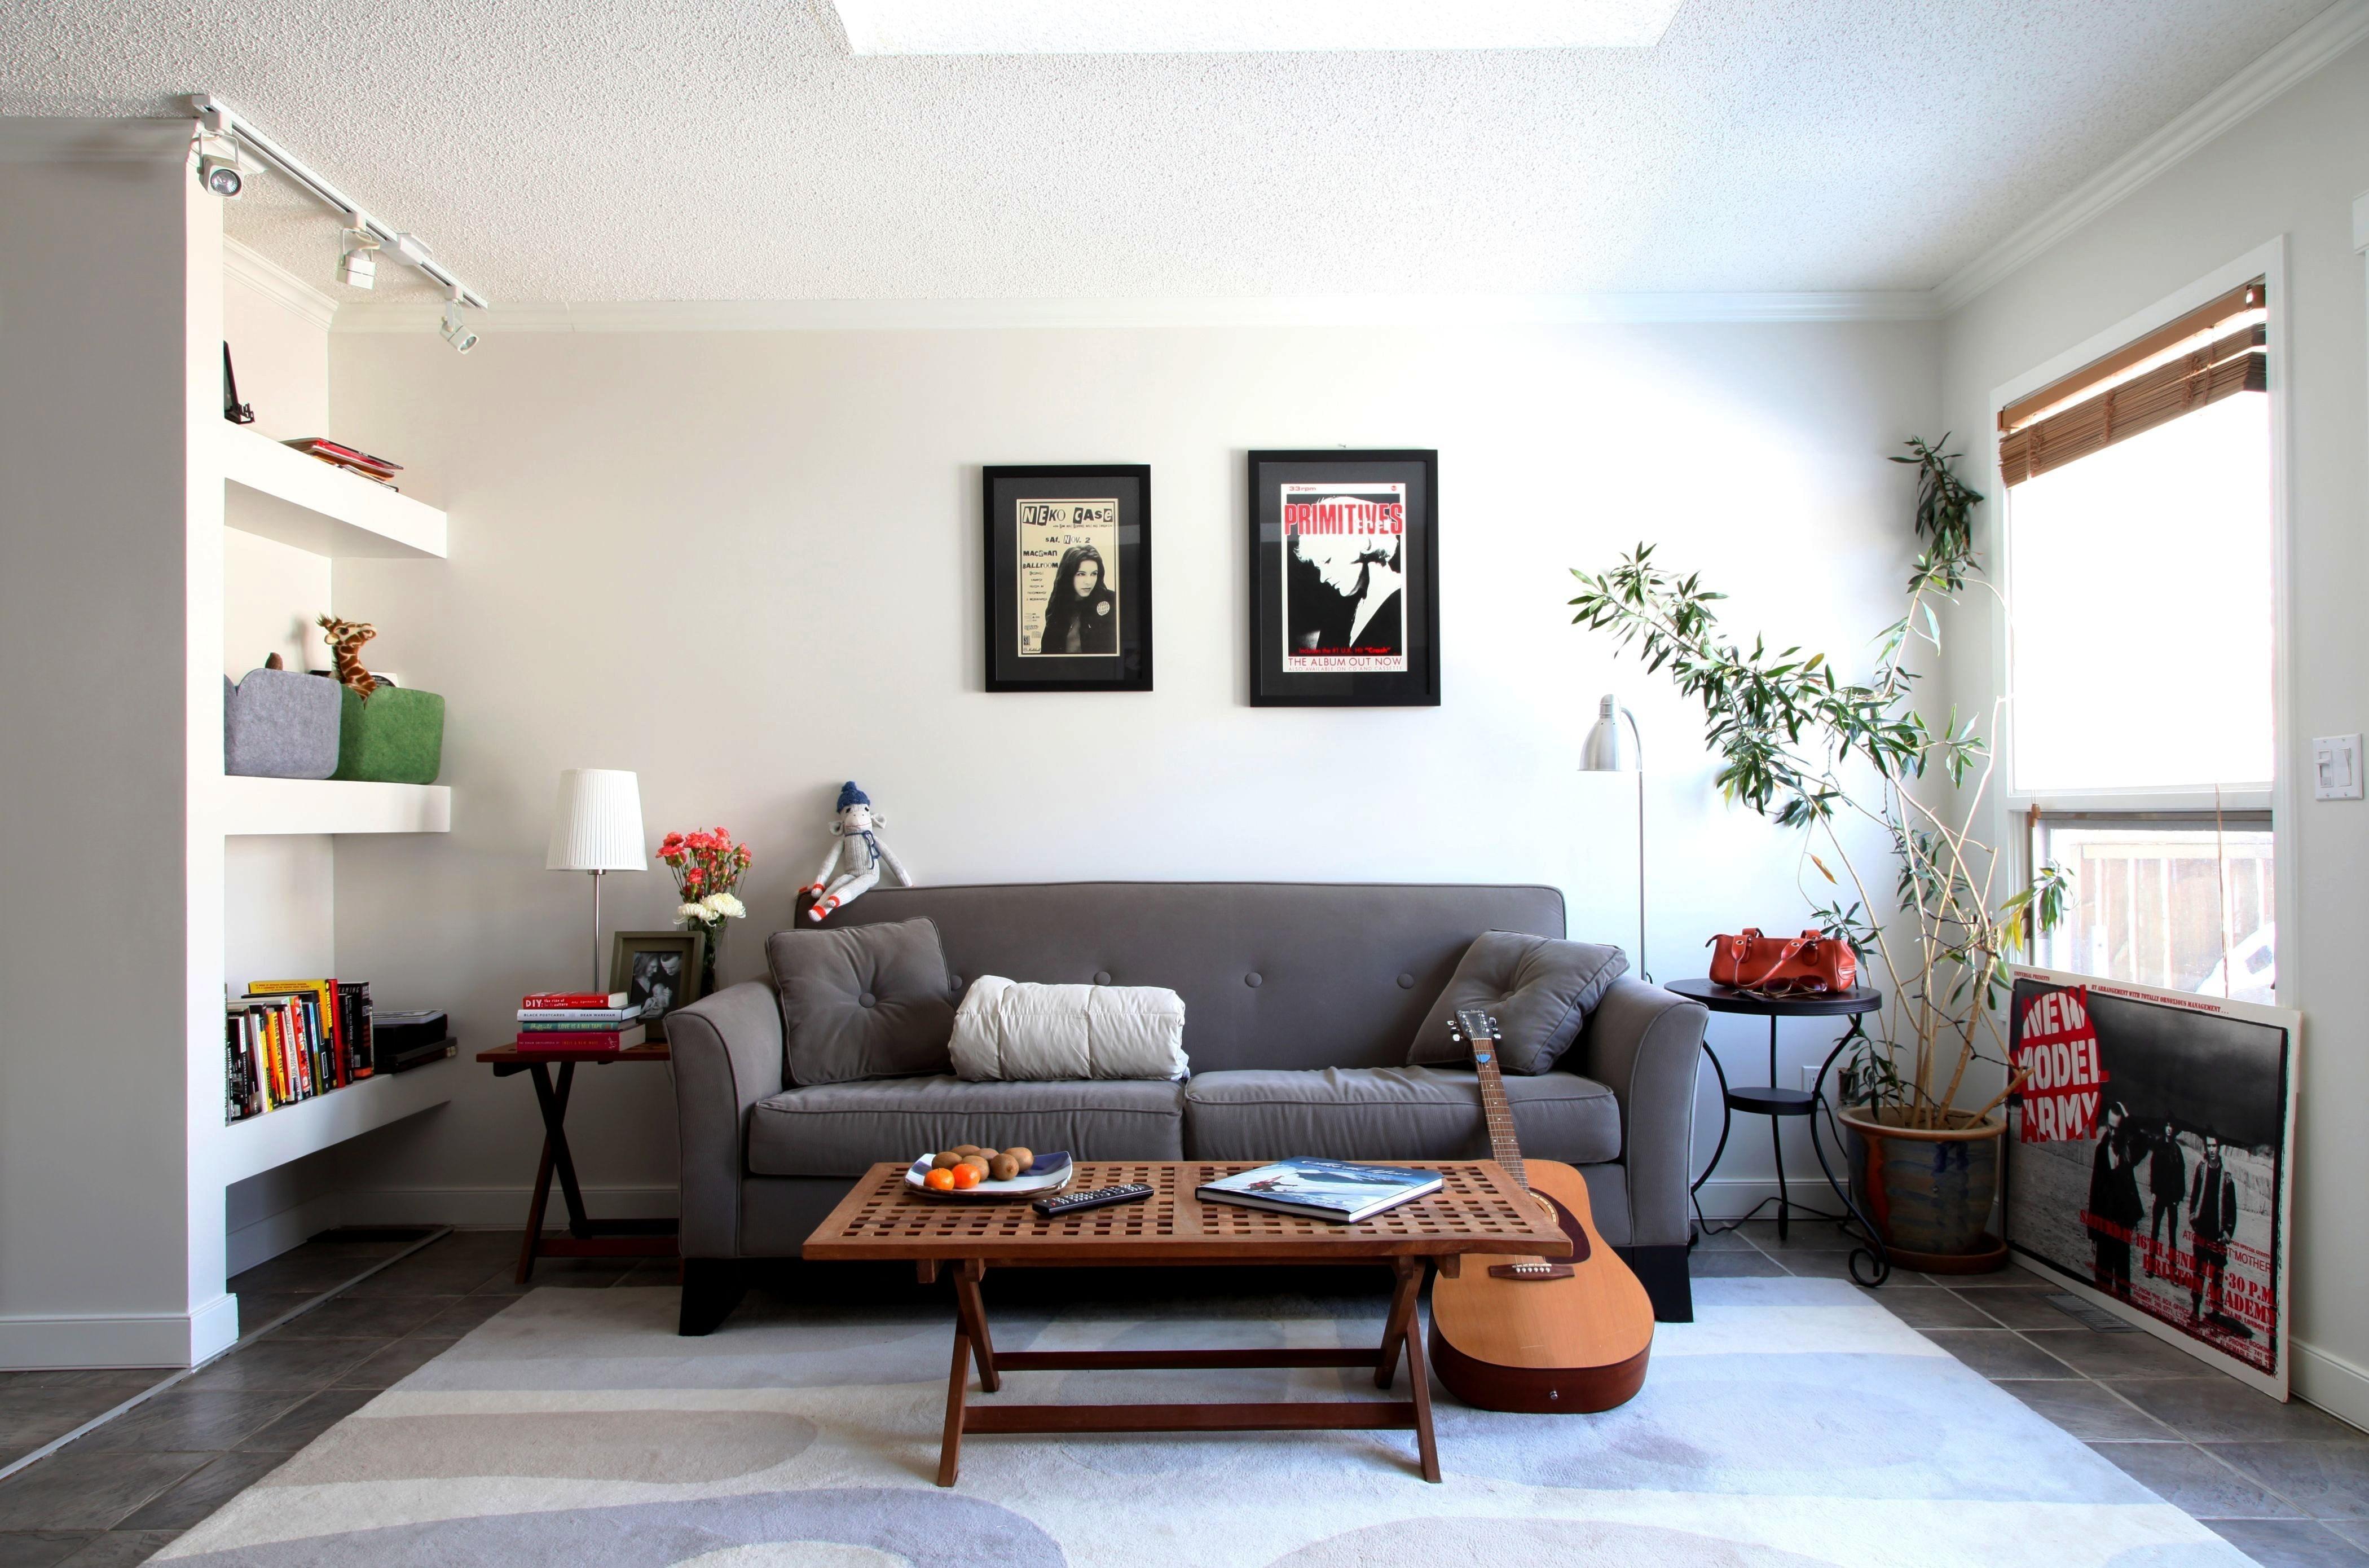 интерьер комната окна диван interior bathroom Windows sofa  № 3530331 загрузить